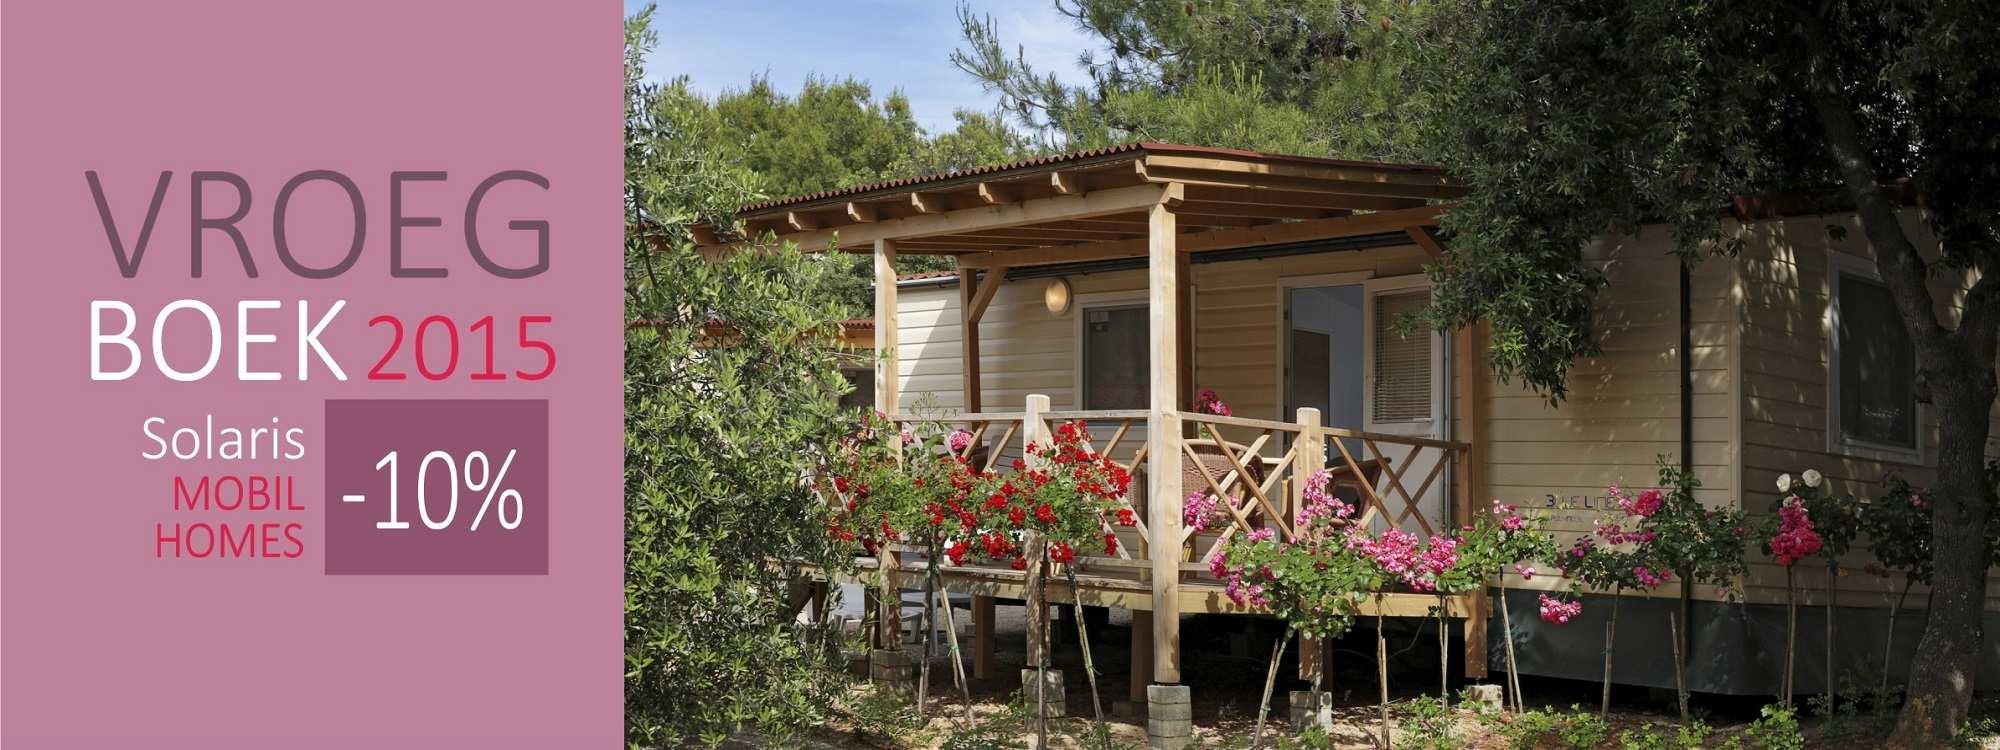 Vroeg_boek_Solaris_Camping_beach_resort_mobil_homes_kroatie